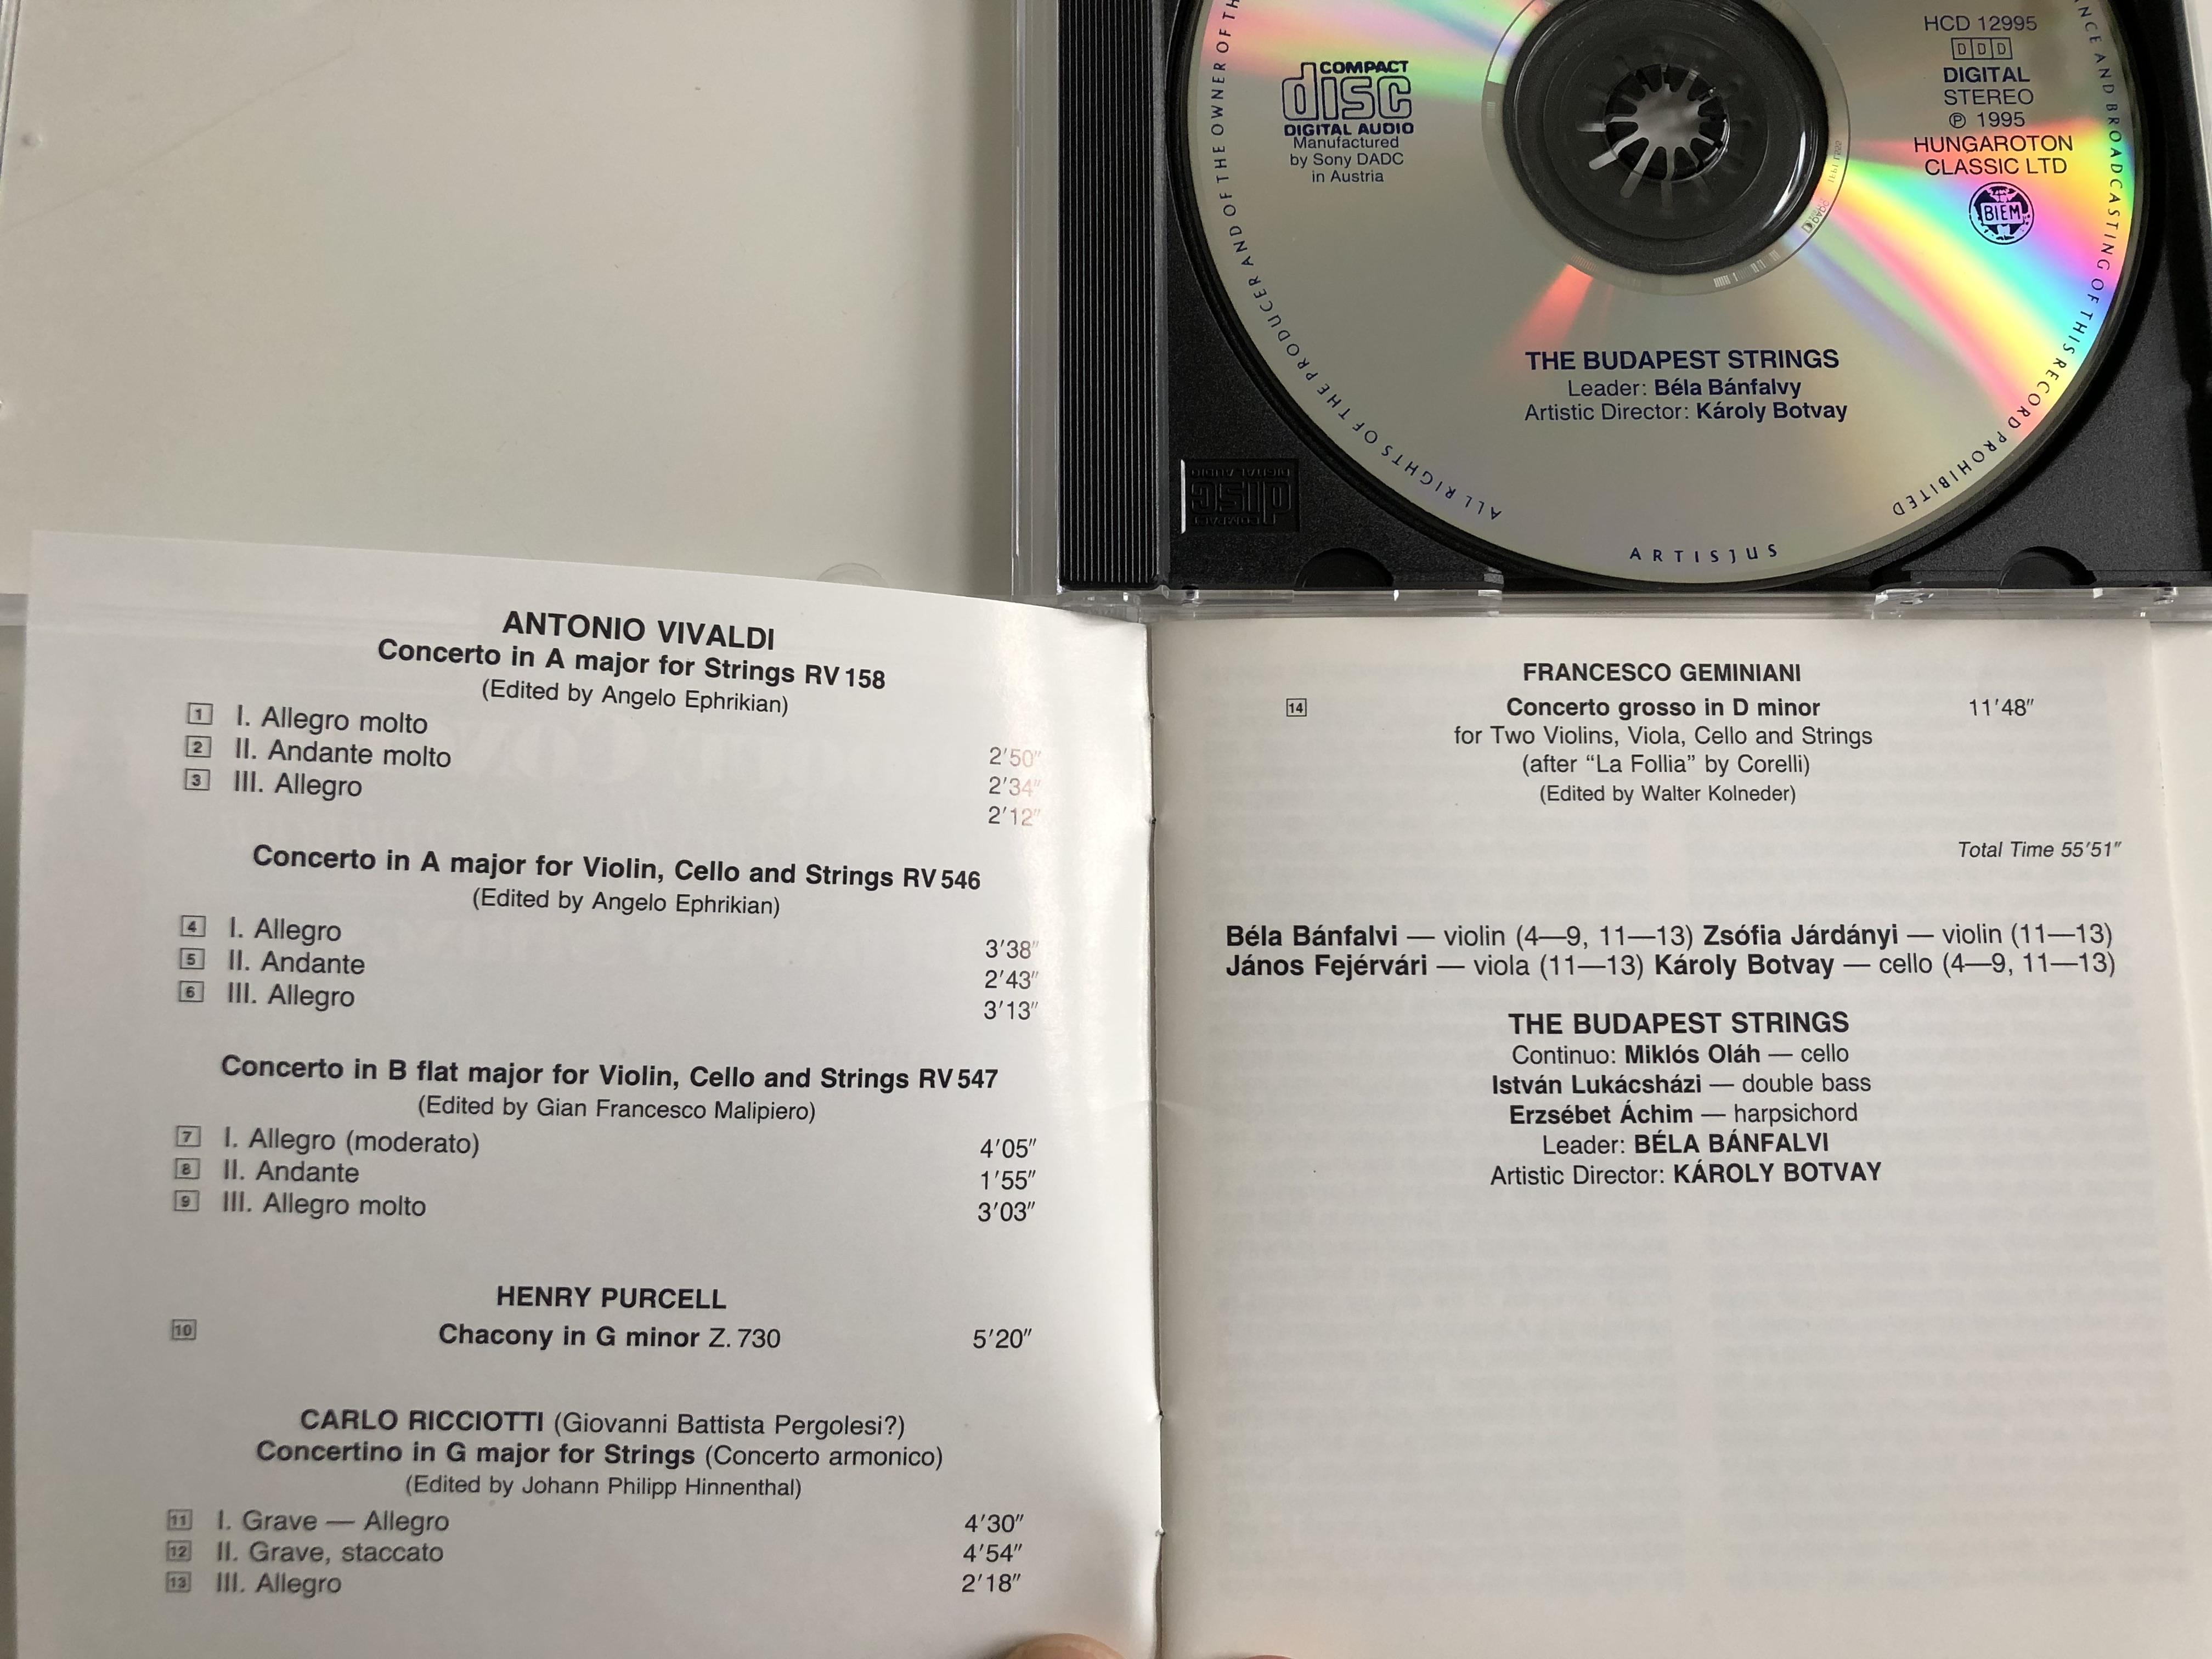 a-baroque-concert-vivaldi-purcell-geminiani-the-budapest-strings-leader-b-la-b-nfalvi-directed-by-k-roly-botvay-hungaroton-audio-cd-1995-stereo-hcd-12995-3-.jpg